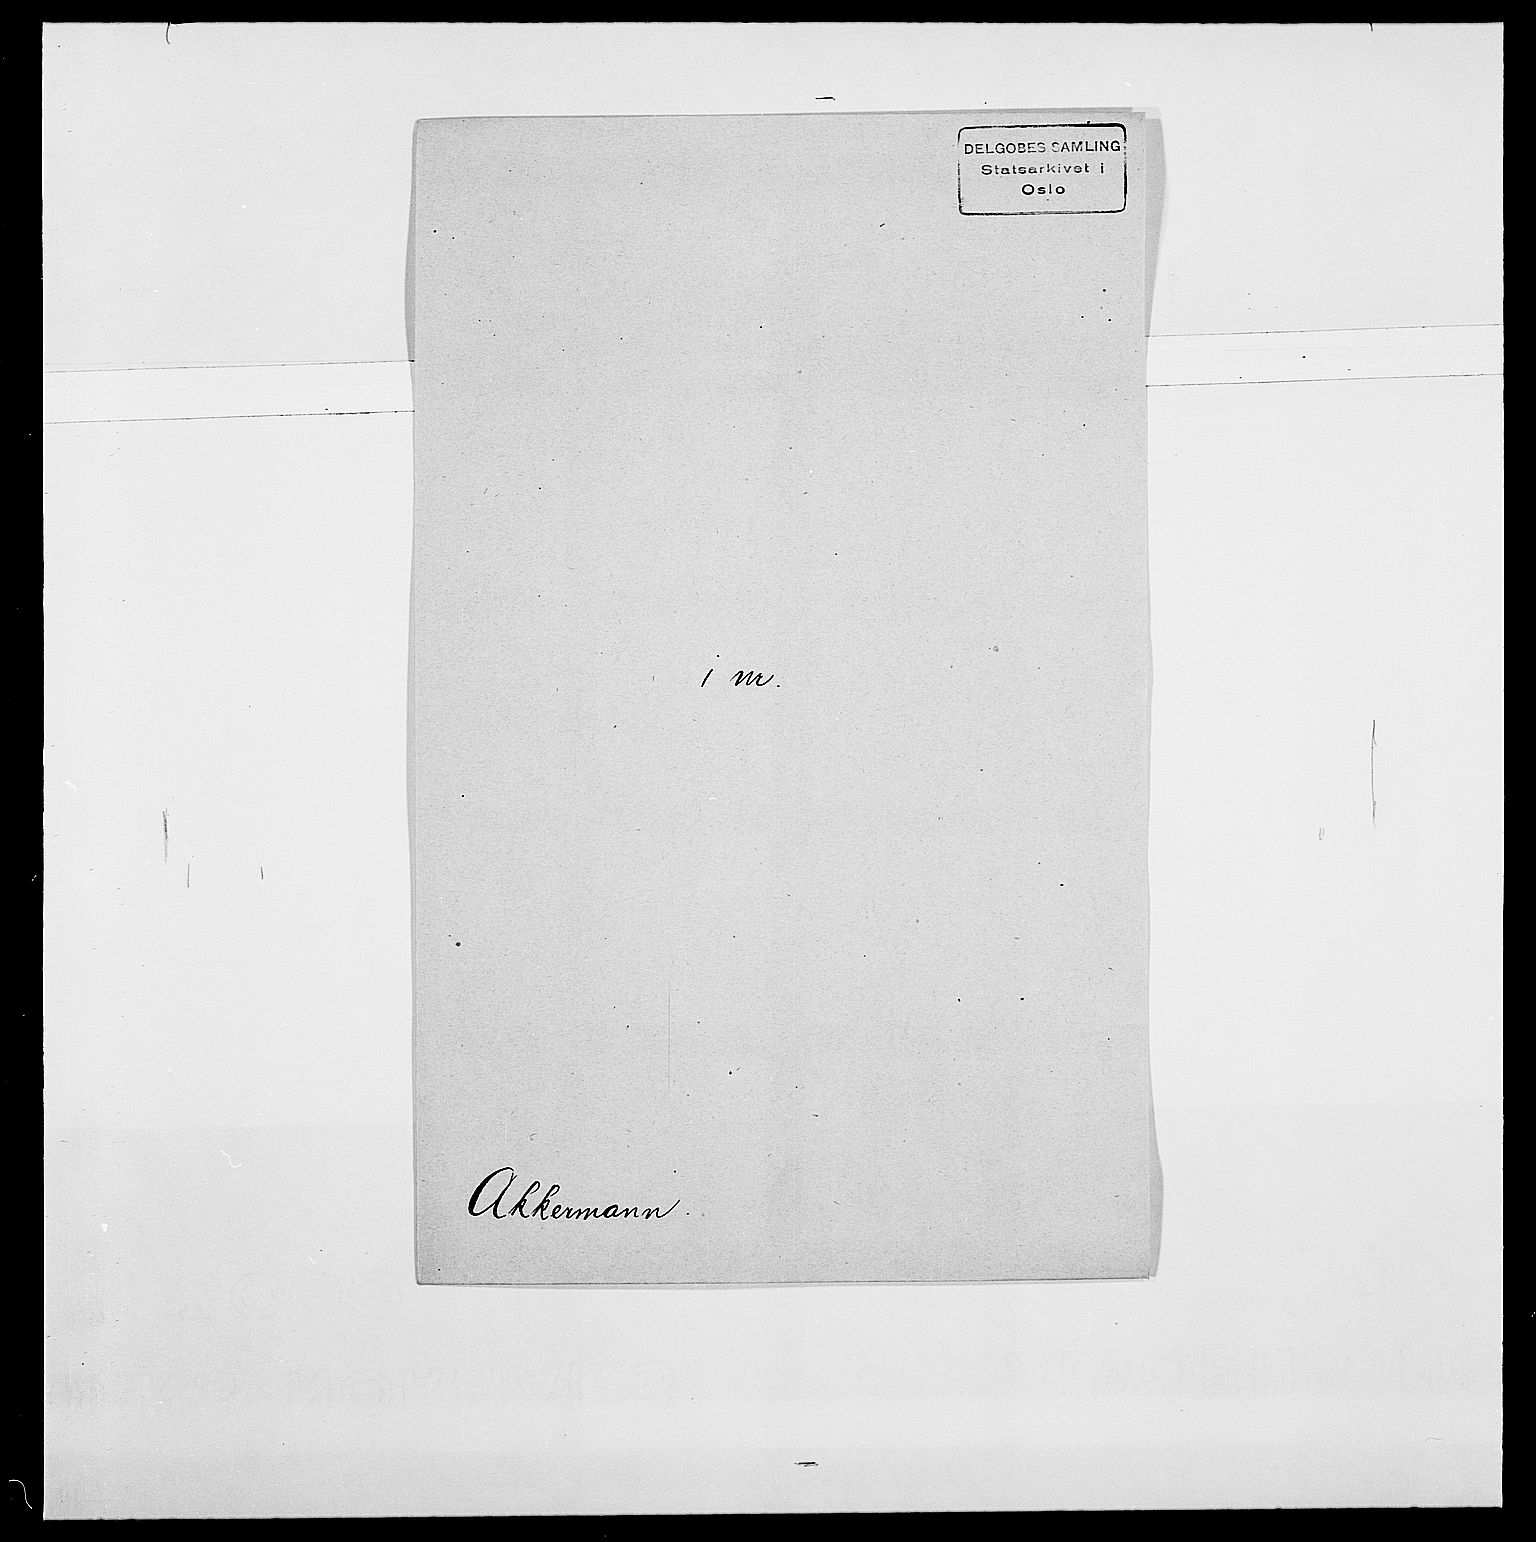 SAO, Delgobe, Charles Antoine - samling, D/Da/L0001: Aabye - Angerman, s. 353